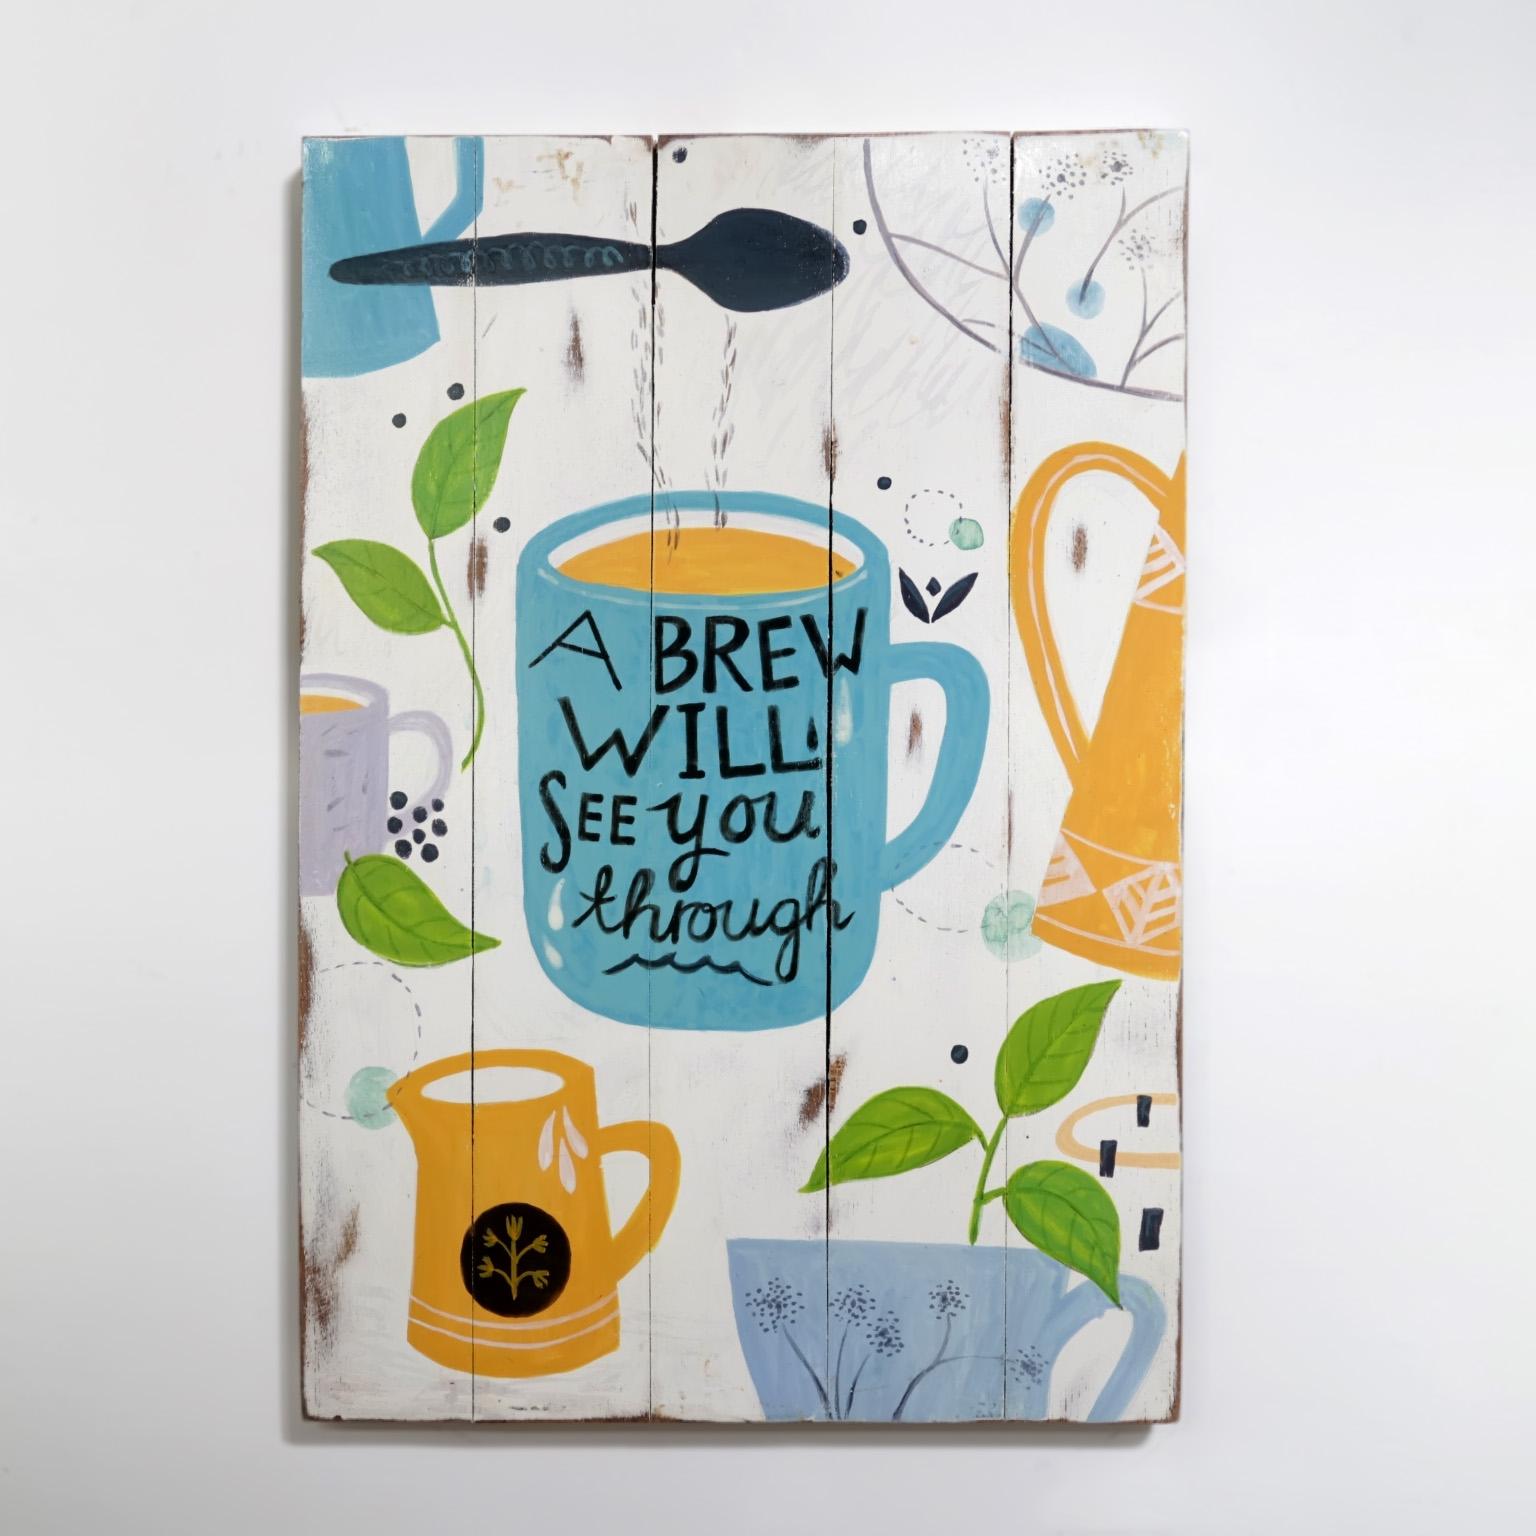 A Brew Will See You Through ~ Poster Kayu Vintage untuk Hiasan Dinding 5f1baeca2a